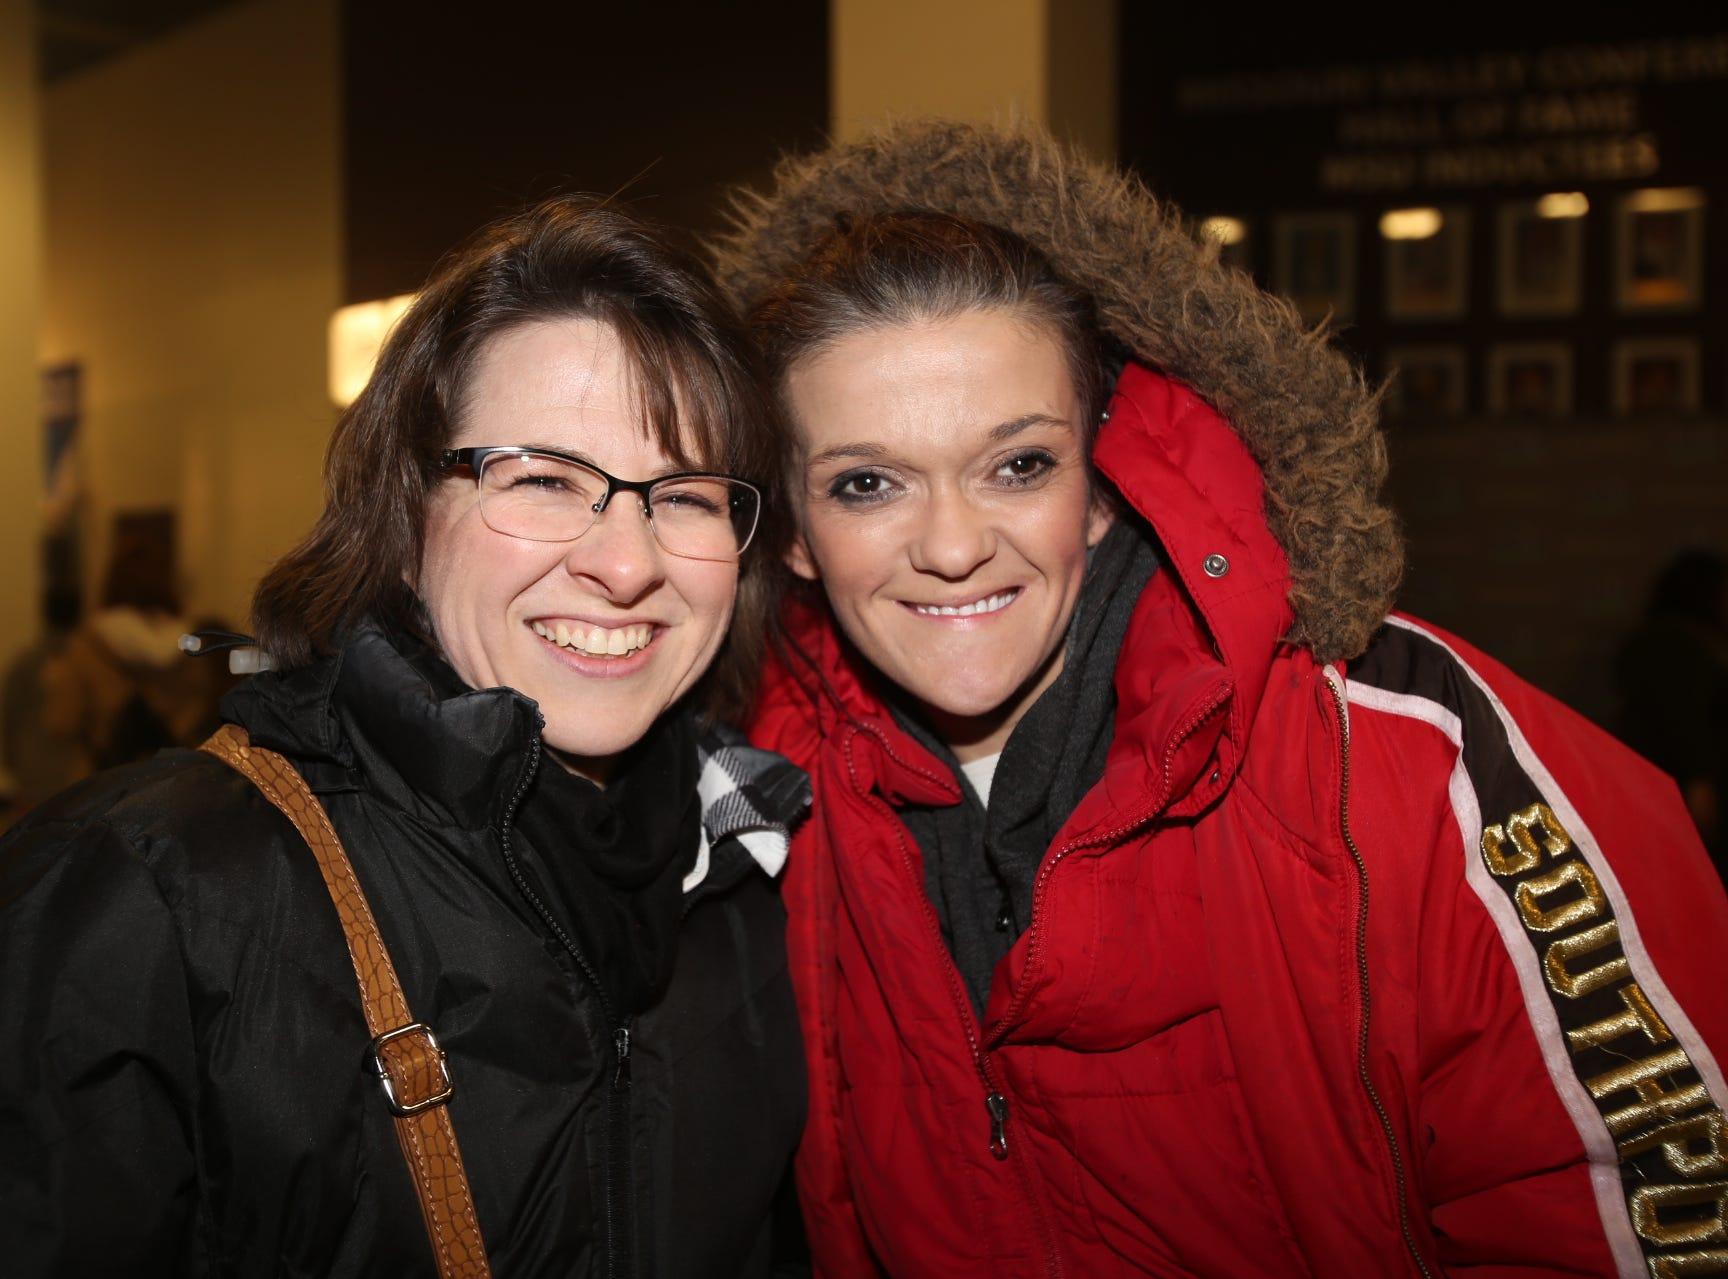 Morgan Talbet and Jennifer Anderson